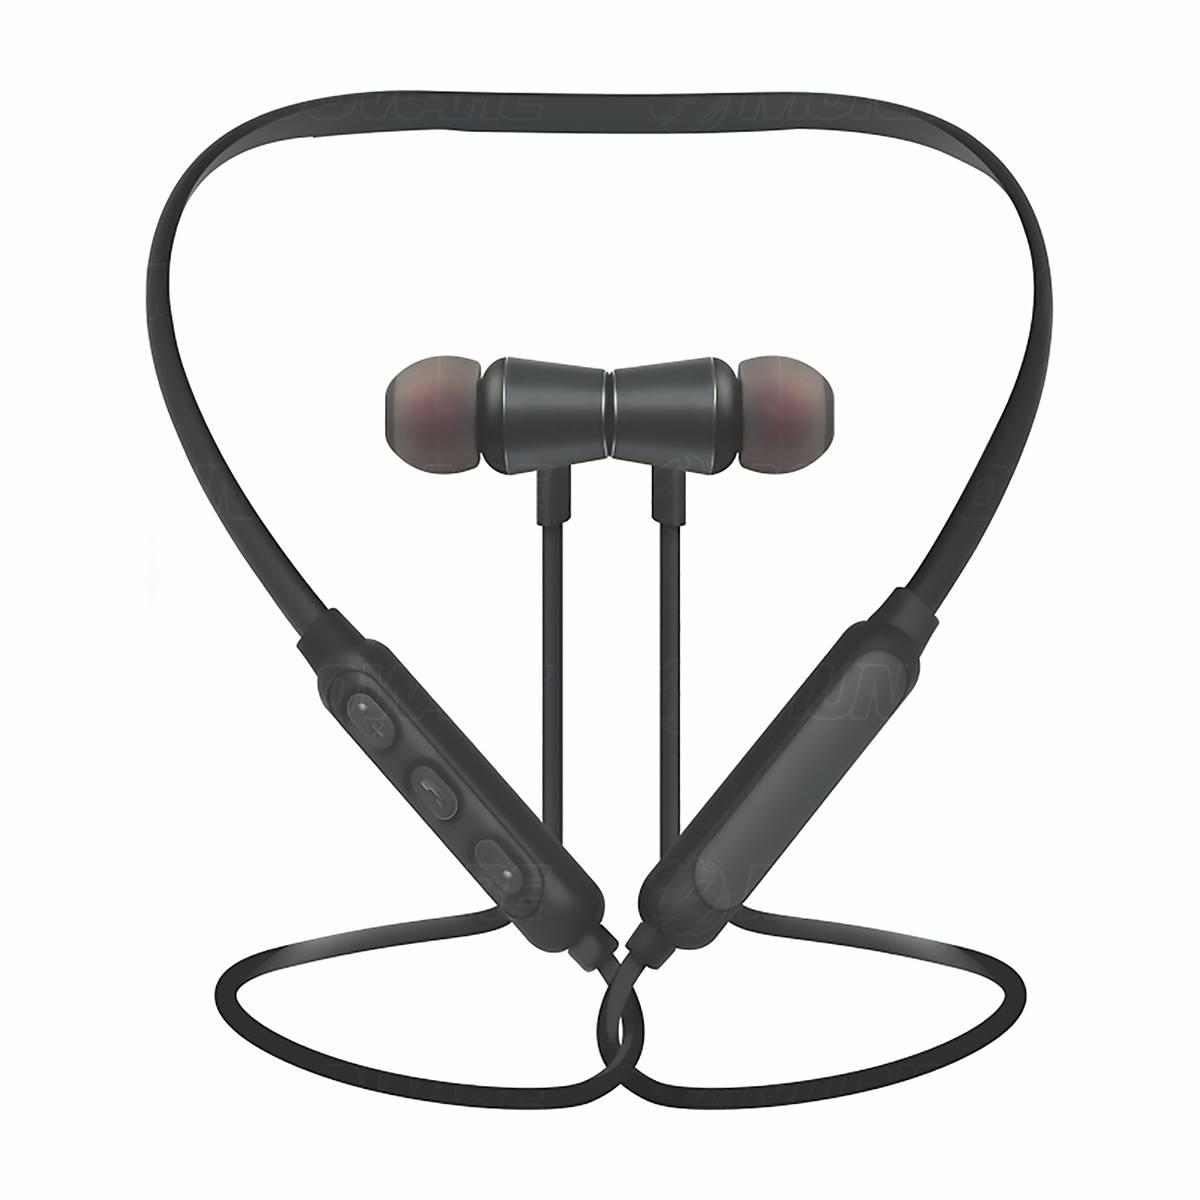 Fone Sports Smart Wireless Stereo Bluetooth com Microfone Embutido para Atender Chamadas Kimaster K33